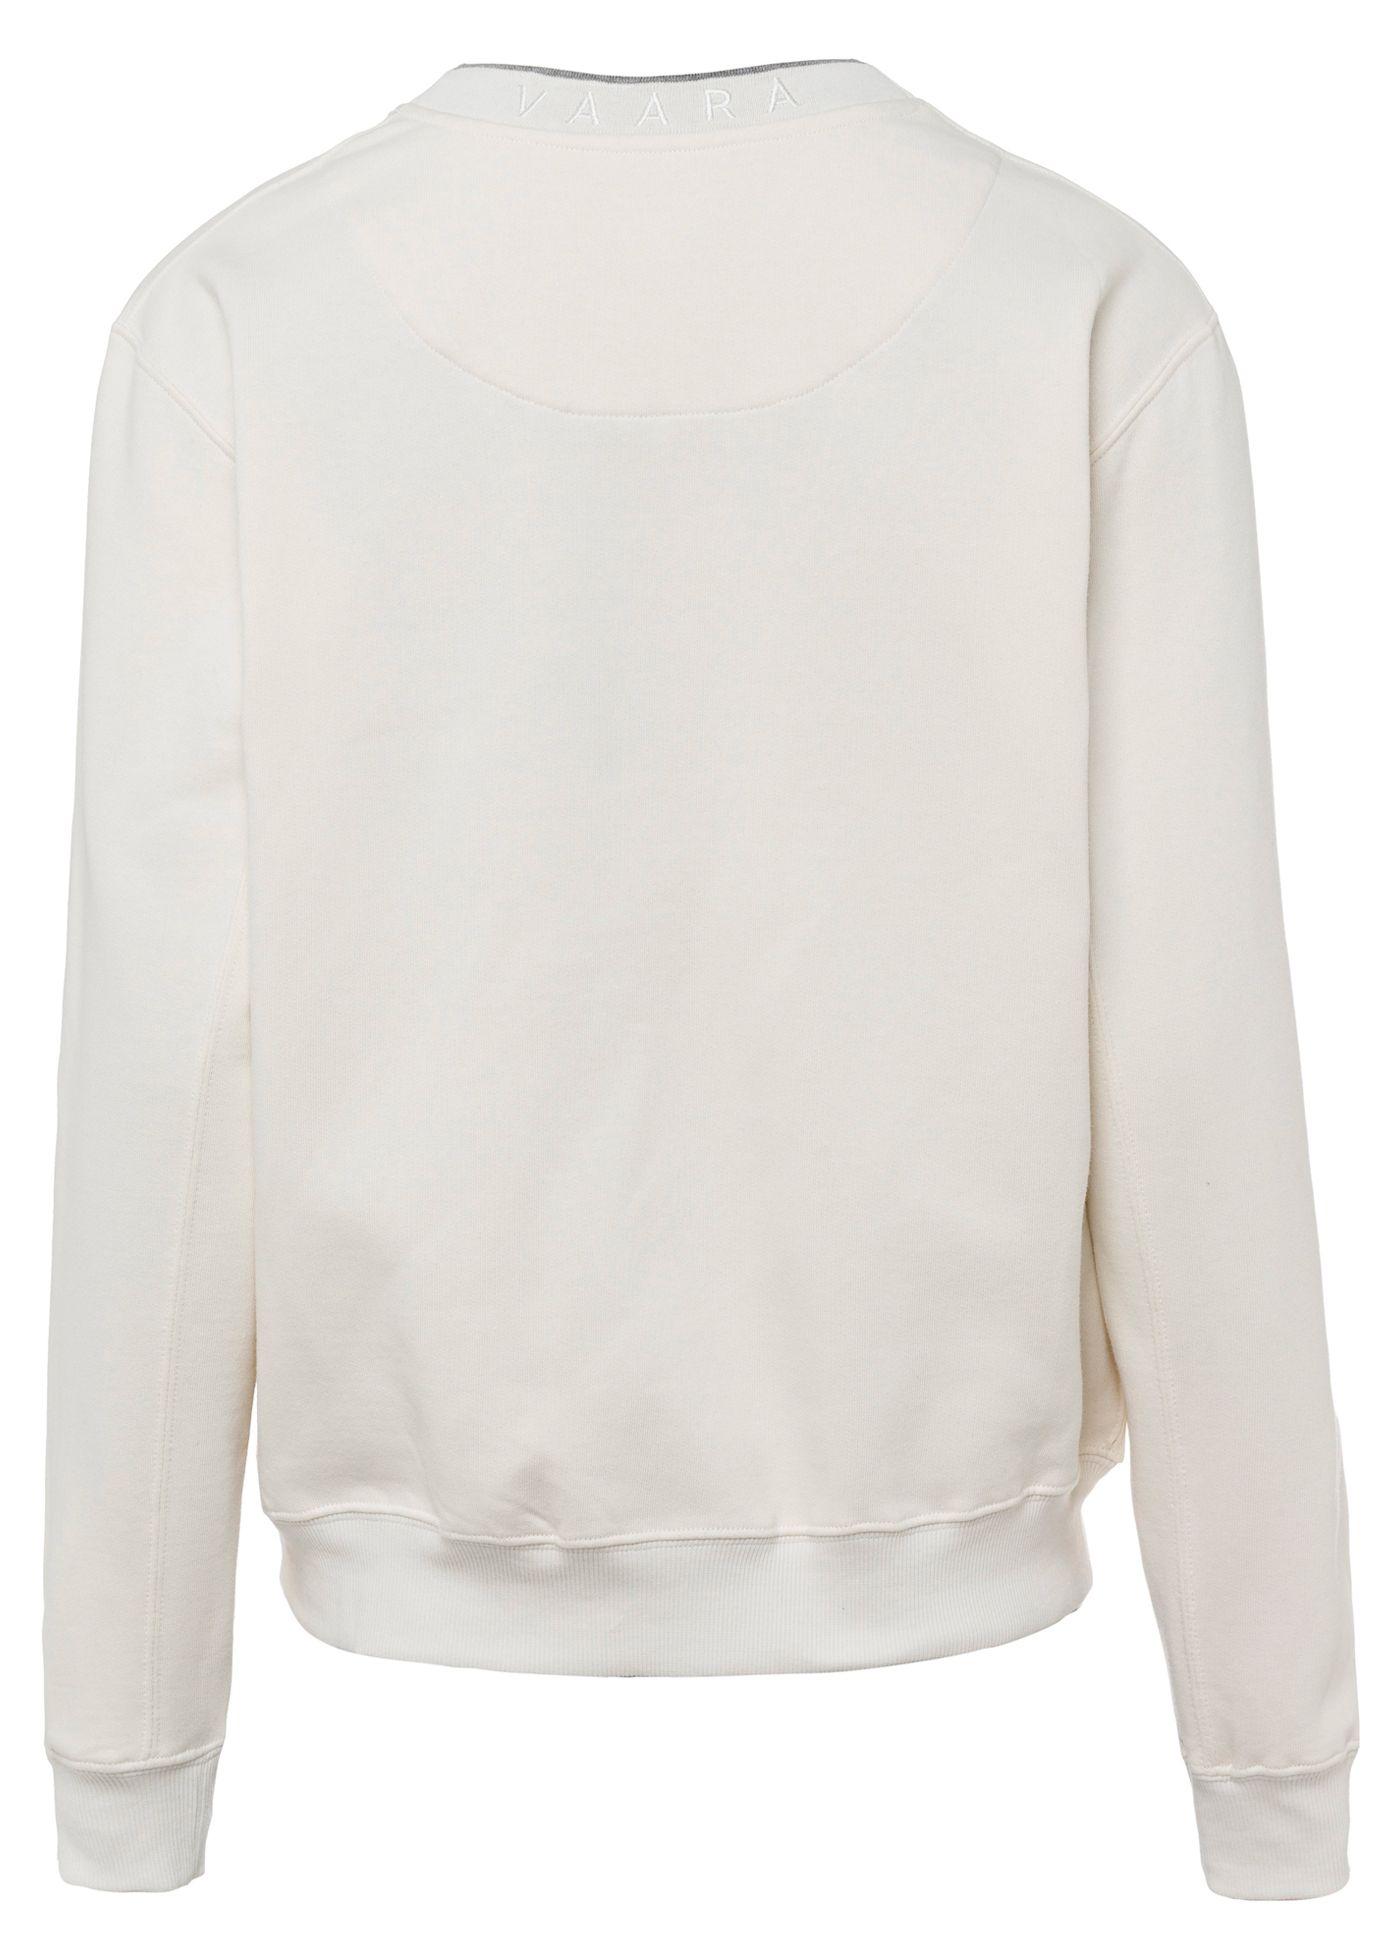 May Organic Sweatshirt image number 1